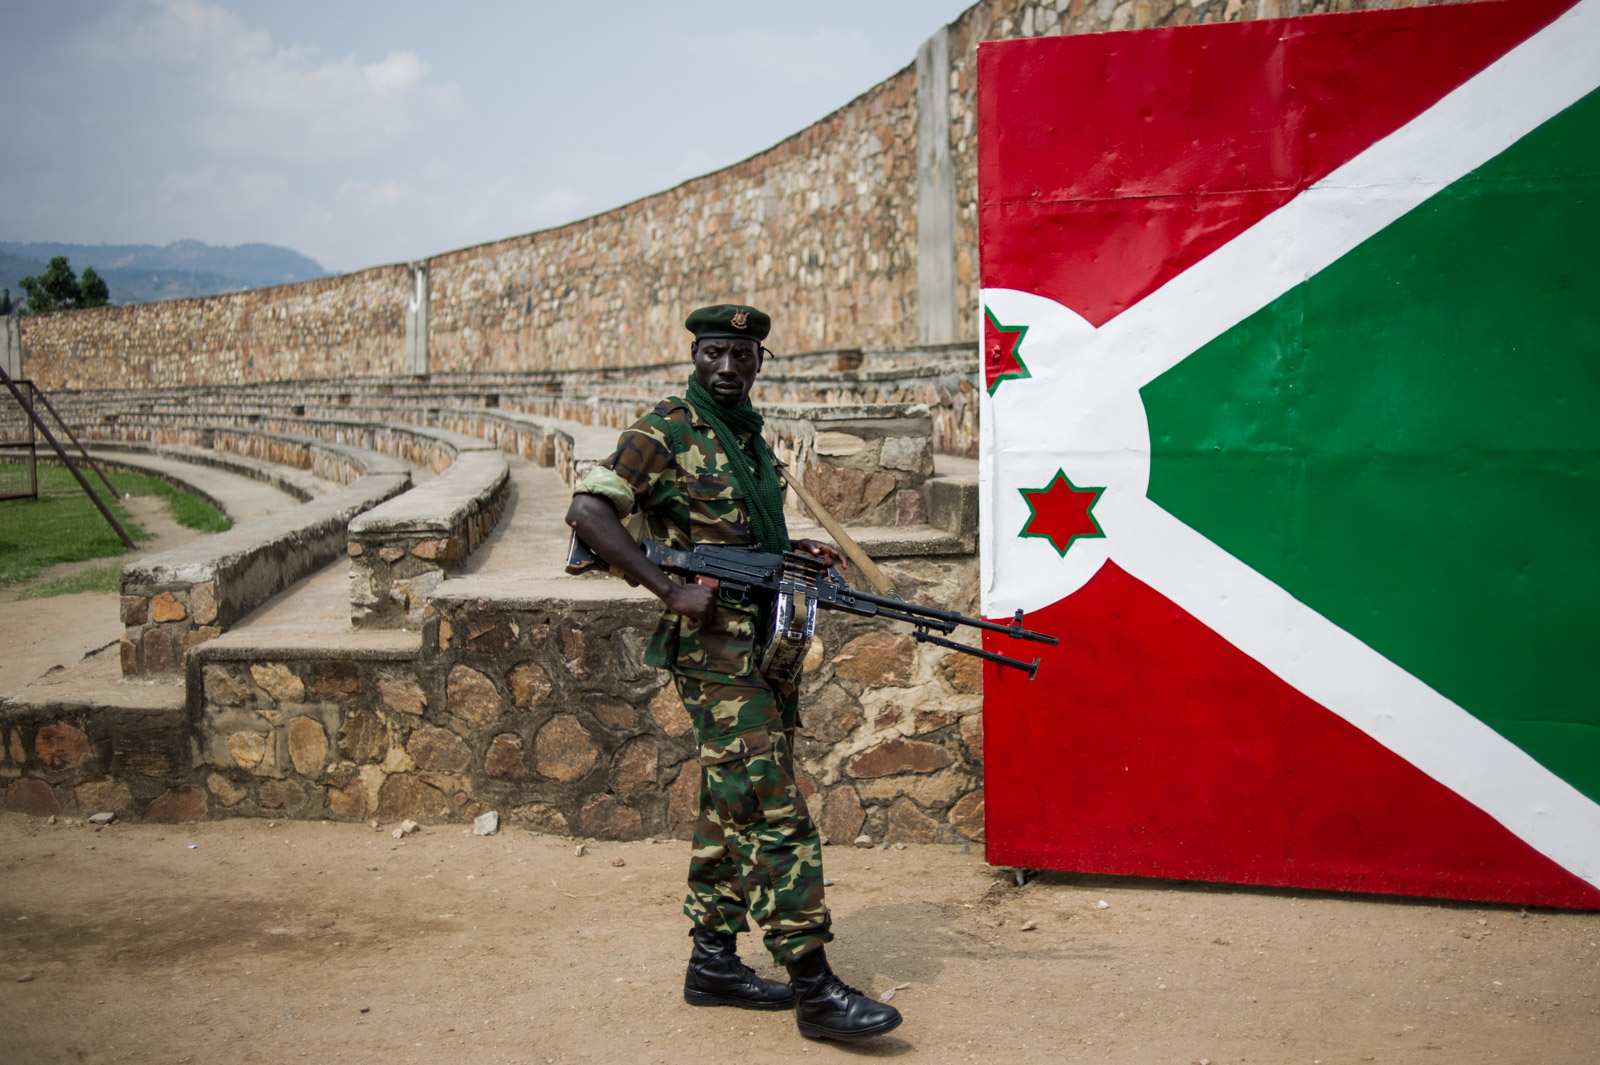 37_PEM_BDI_Burundi_5865.jpg